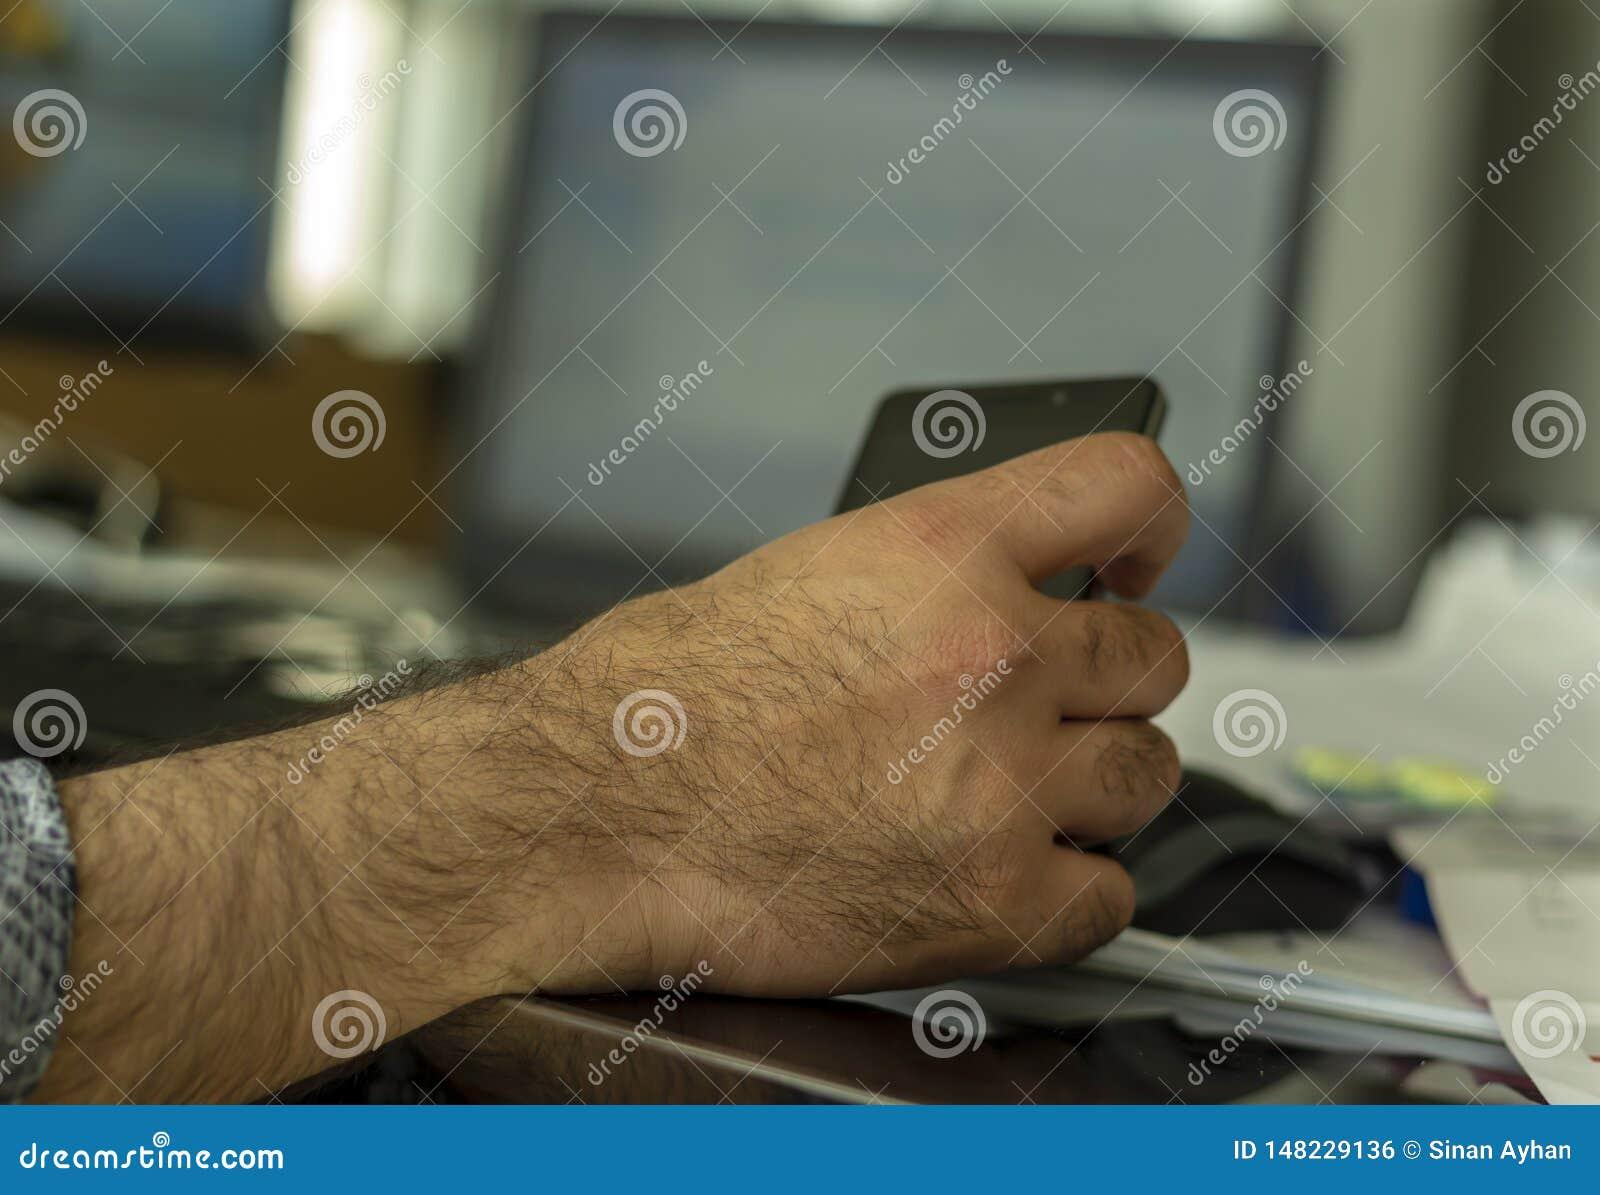 A man handling him mobile phone